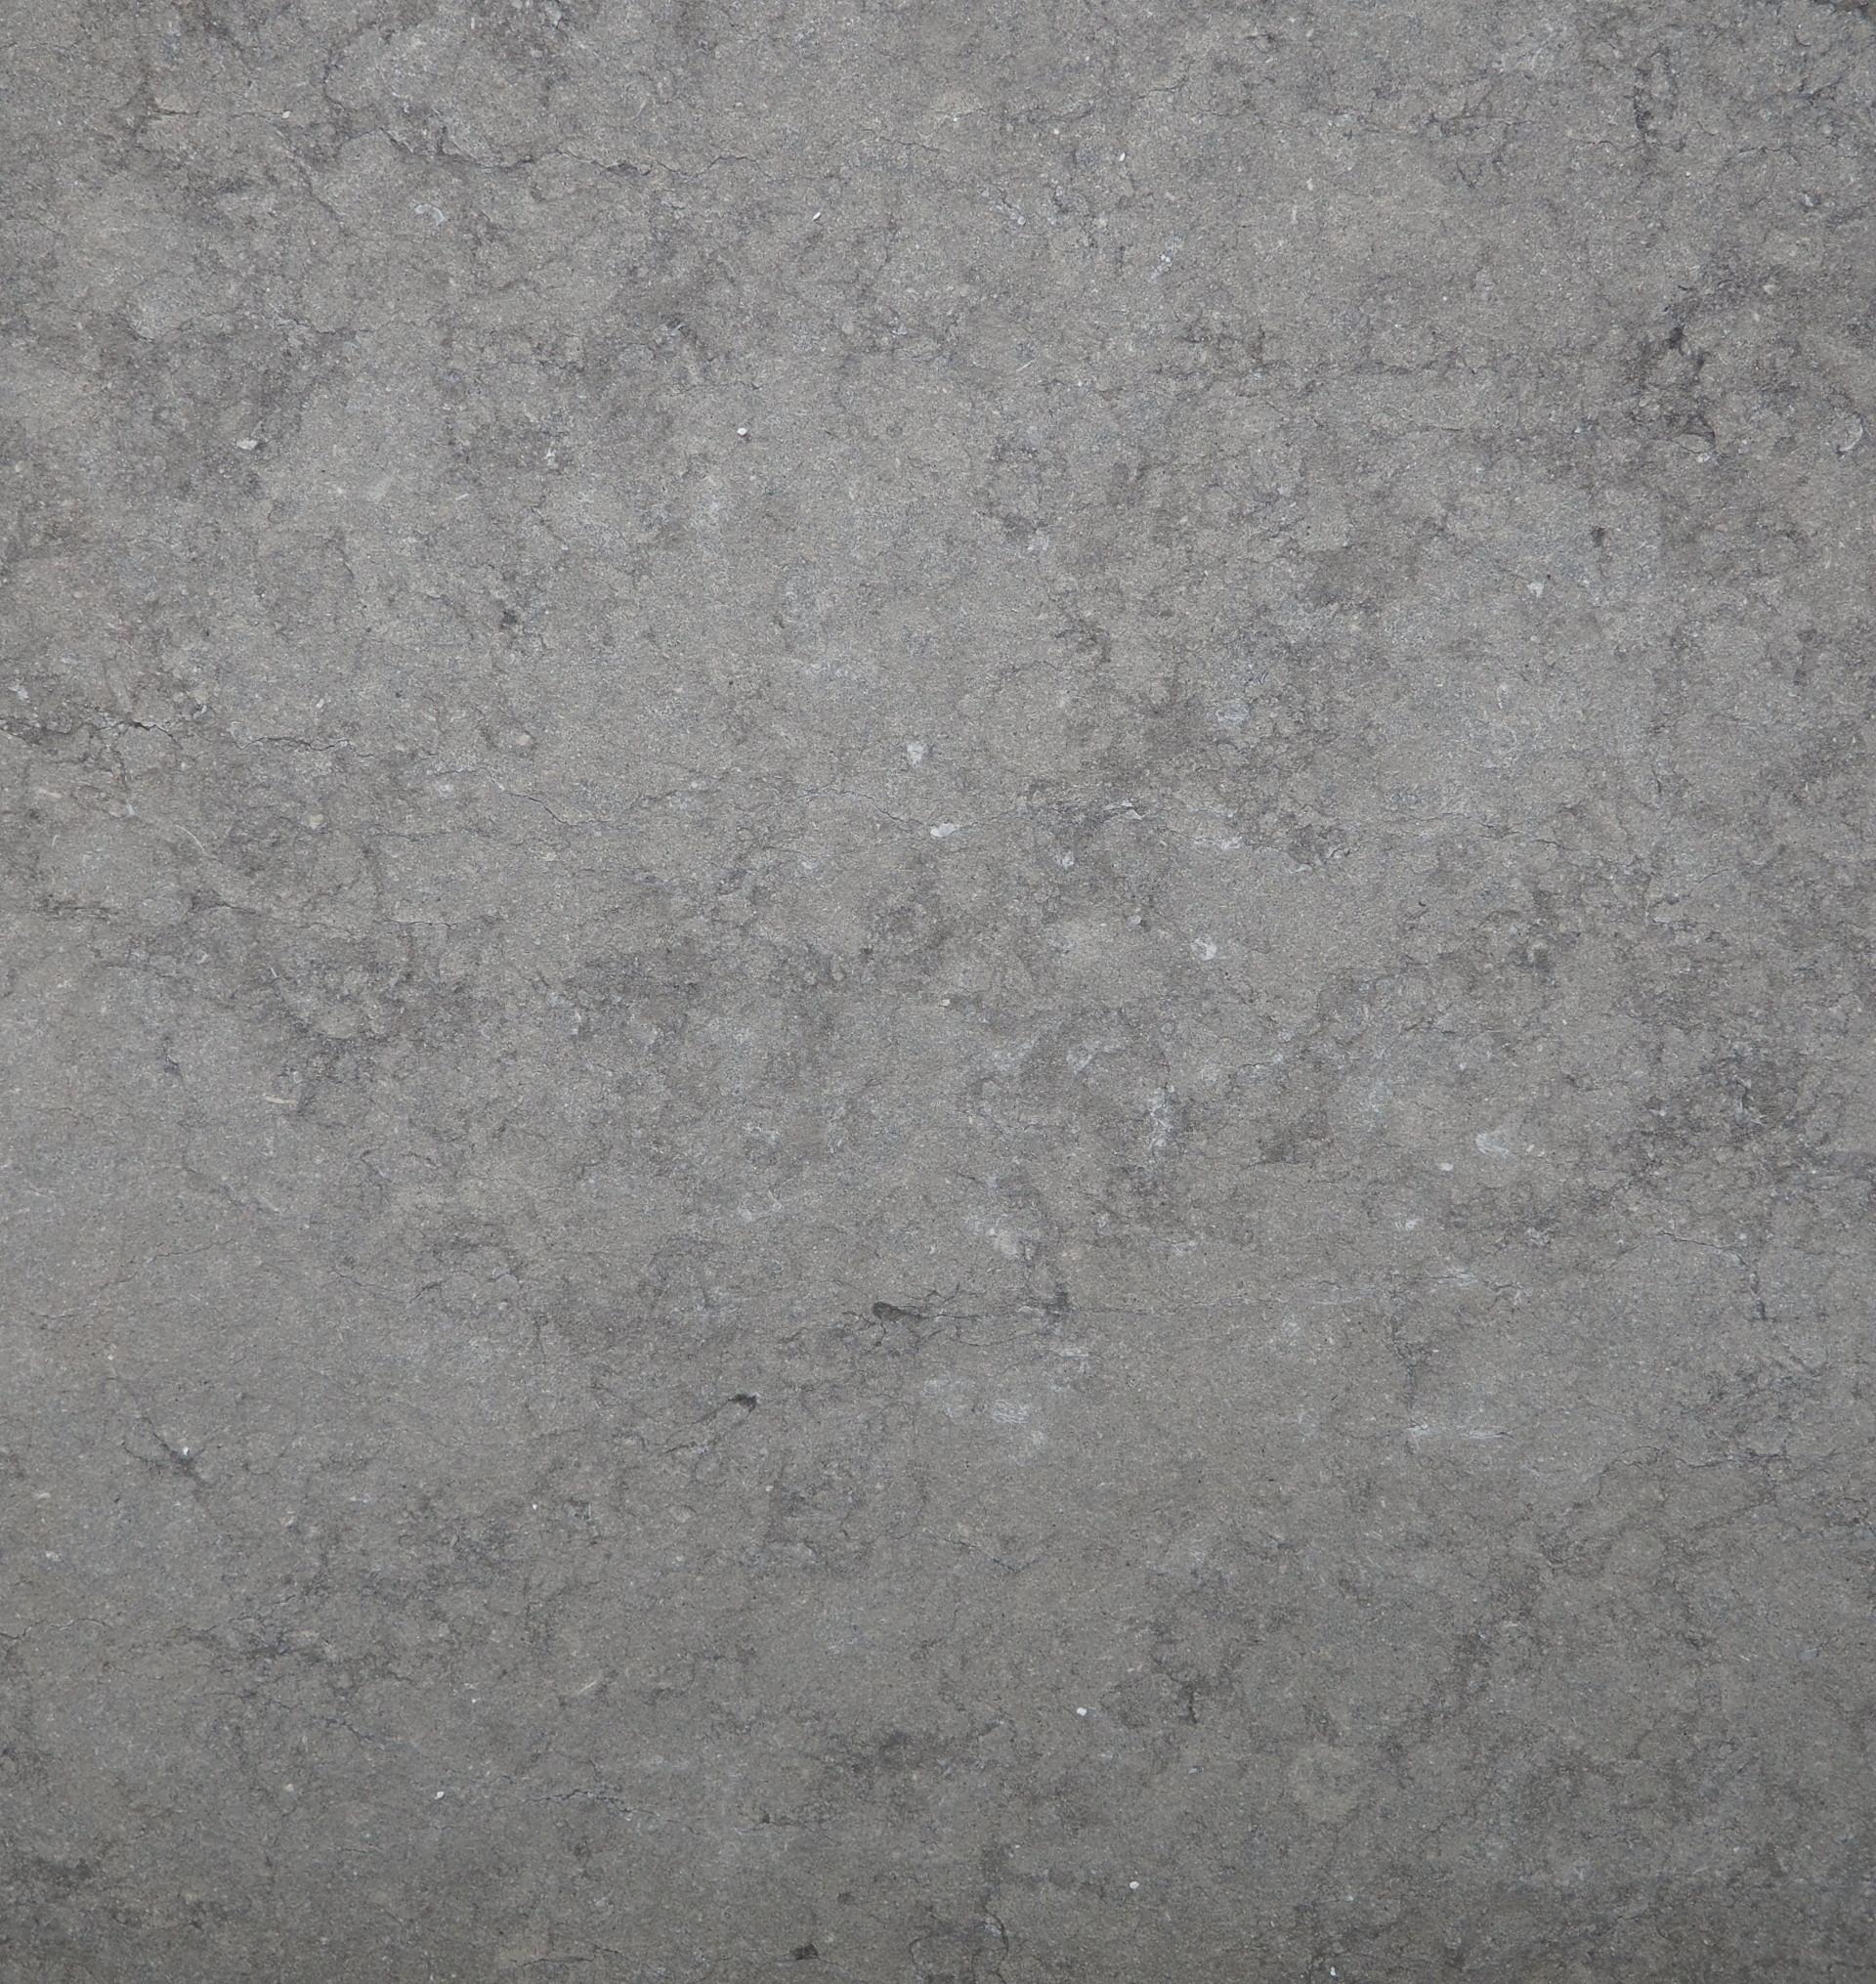 Pedra Gris